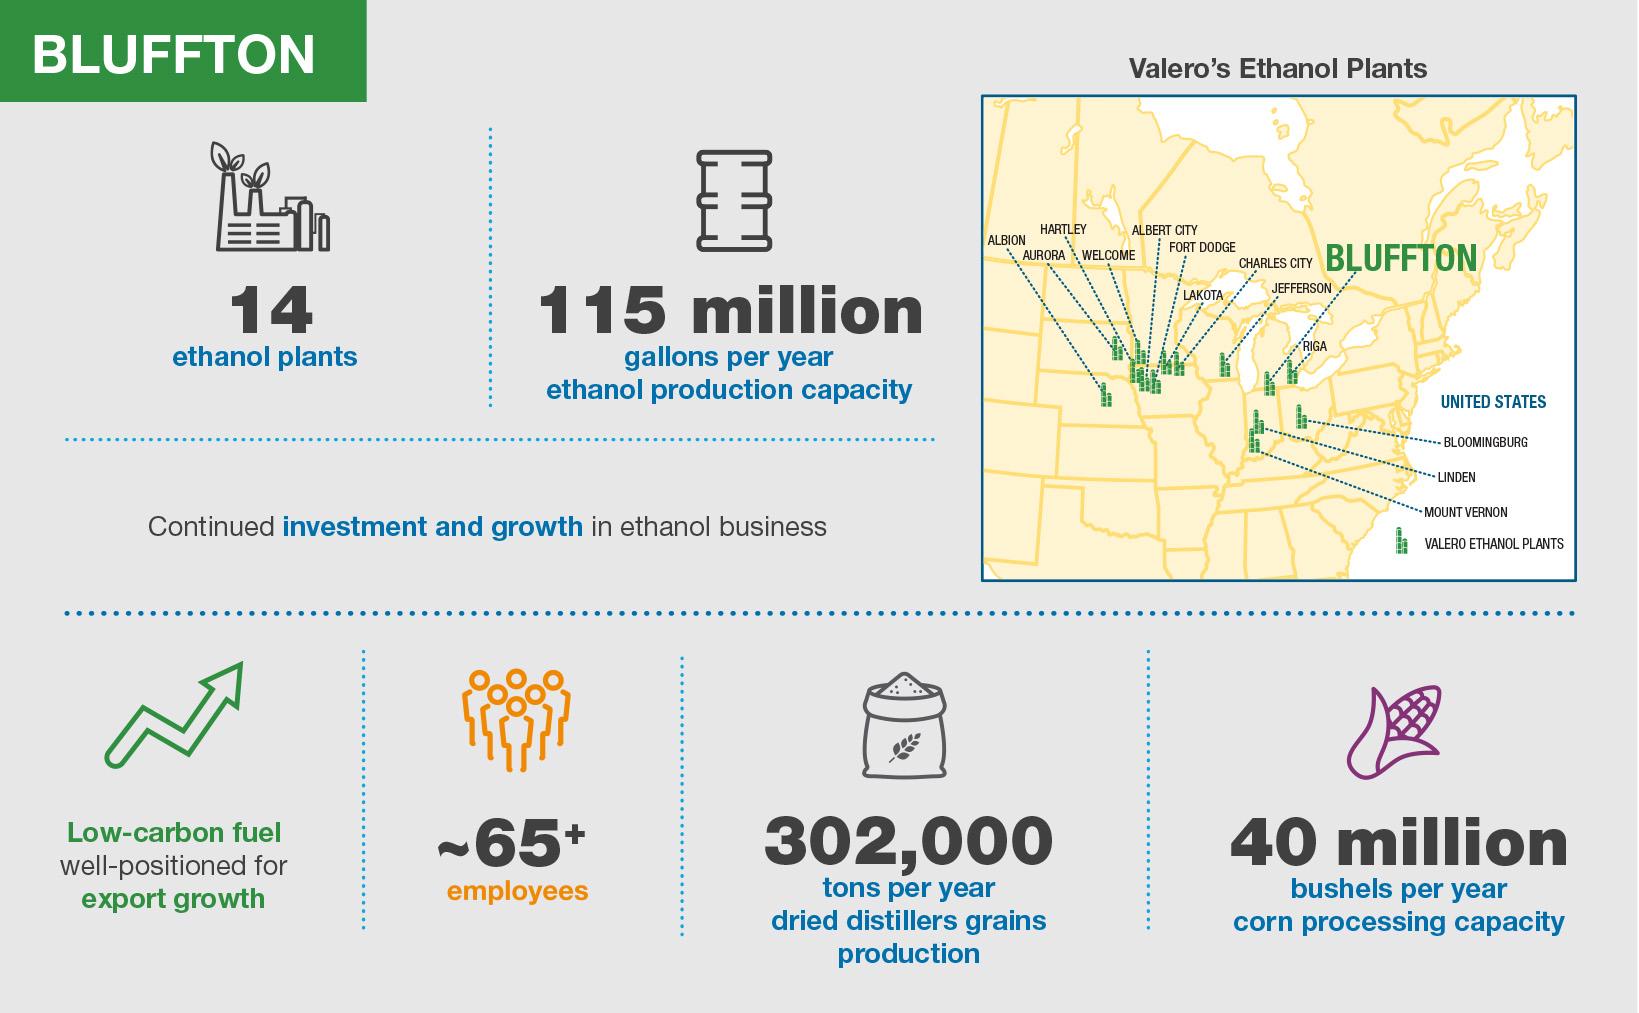 Valero Bluffton Ethanol Plant Infographic